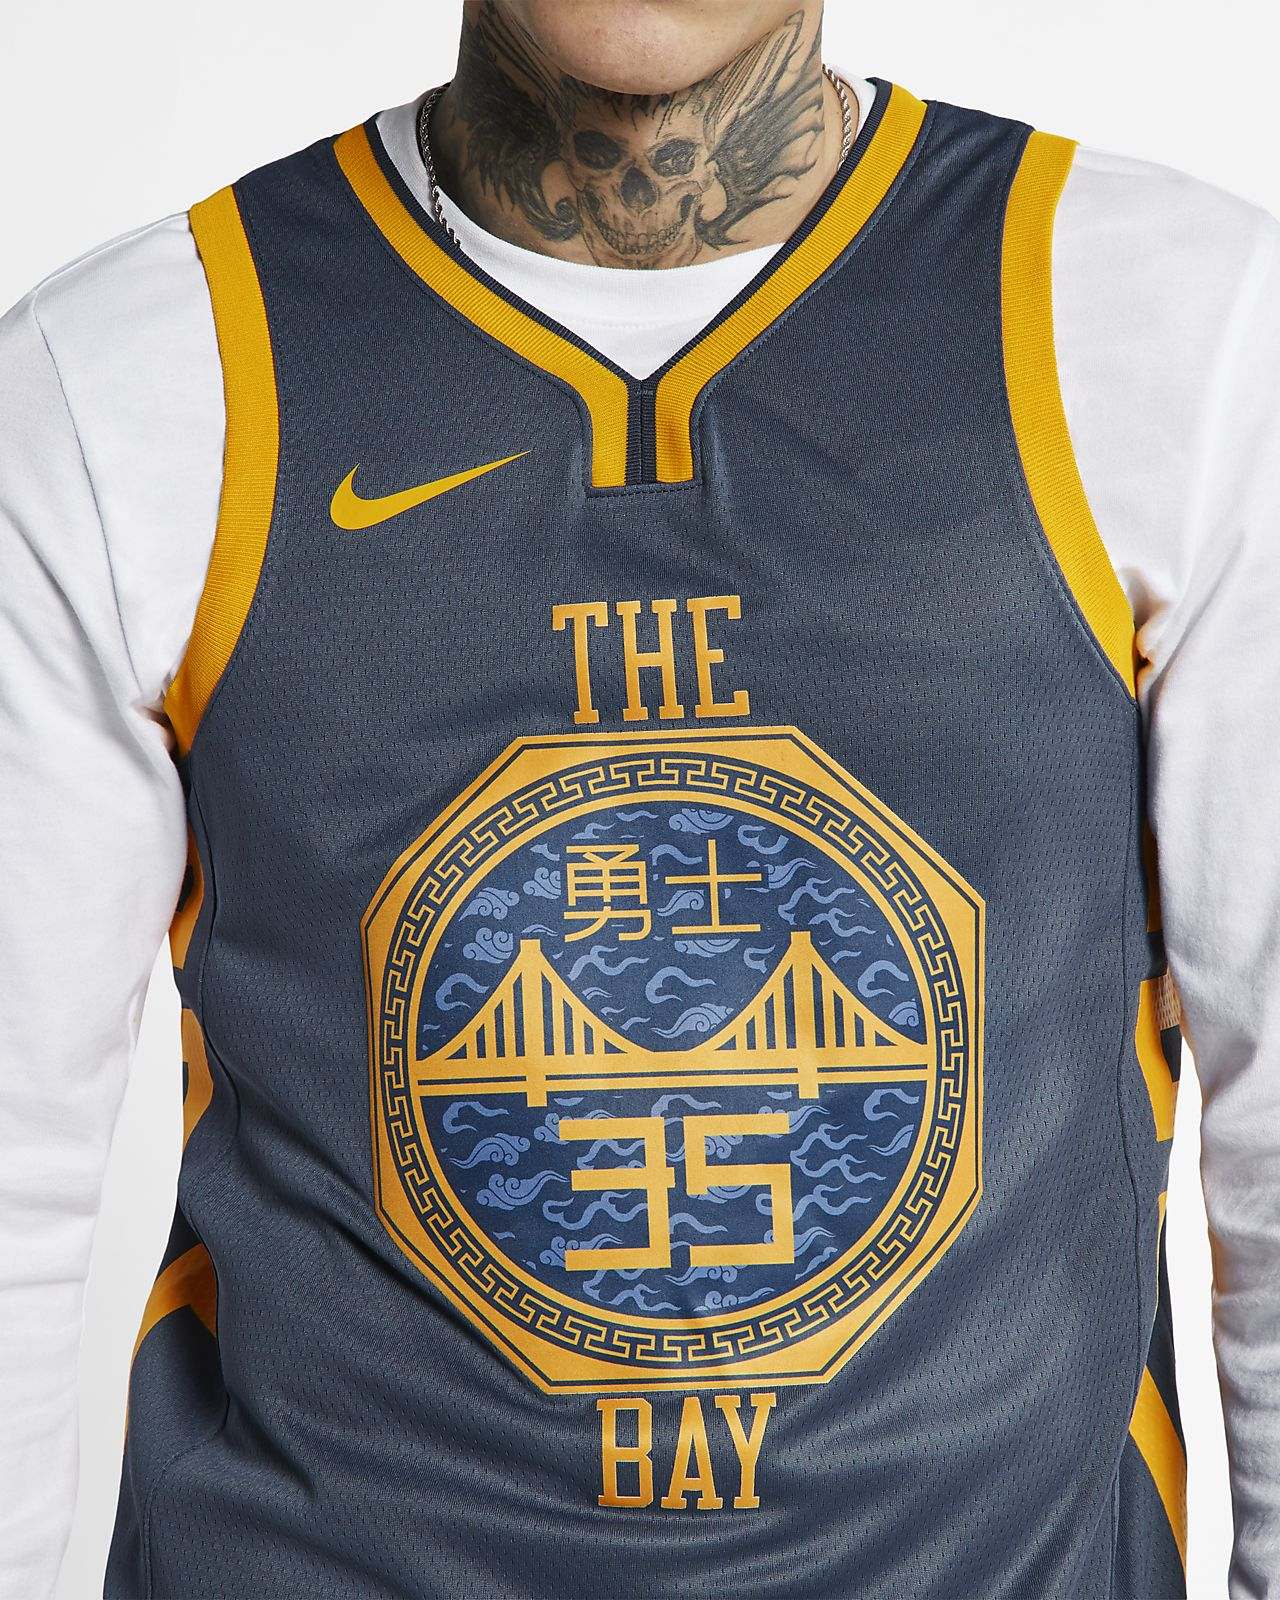 74c7370a01c18 ... Maillot connecté Nike NBA Kevin Durant City Edition Swingman (Golden  State Warriors) pour Homme